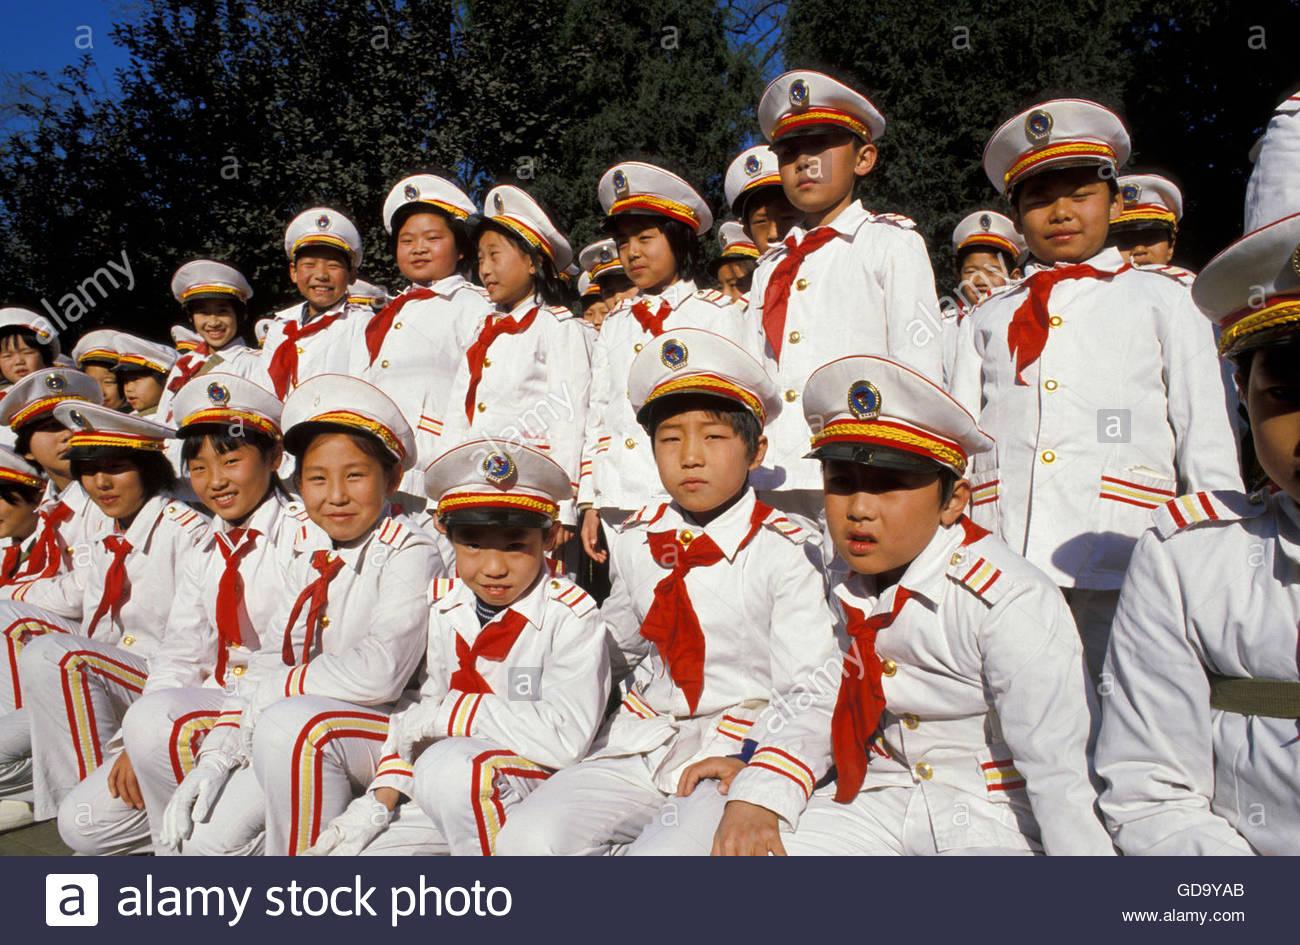 China Beijing School Boys Stock Photo Royalty Free Image  # Bois En Chaene